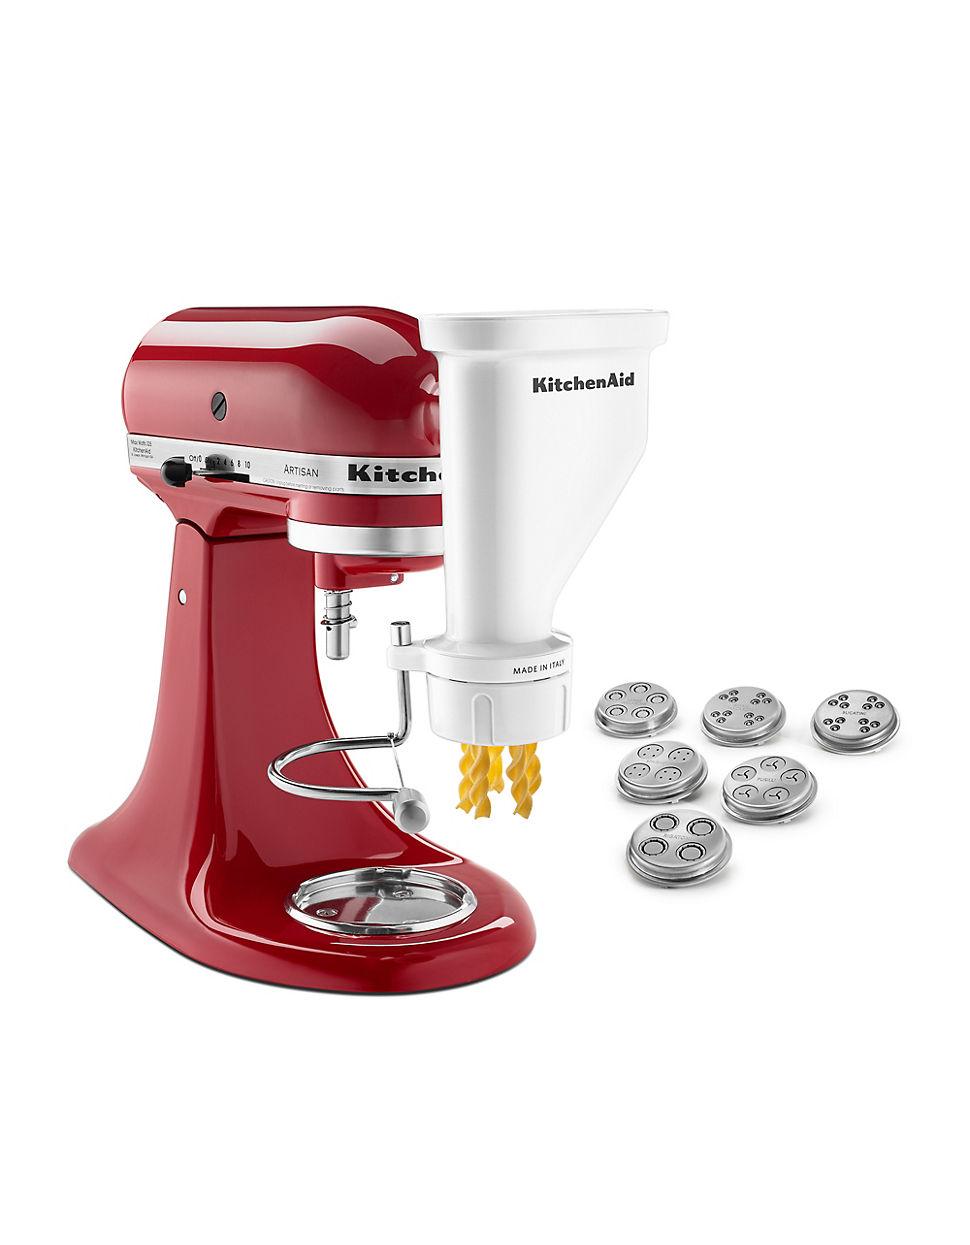 KITCHENAID | Small Appliances | Appliances | Home | Hudson\'s Bay